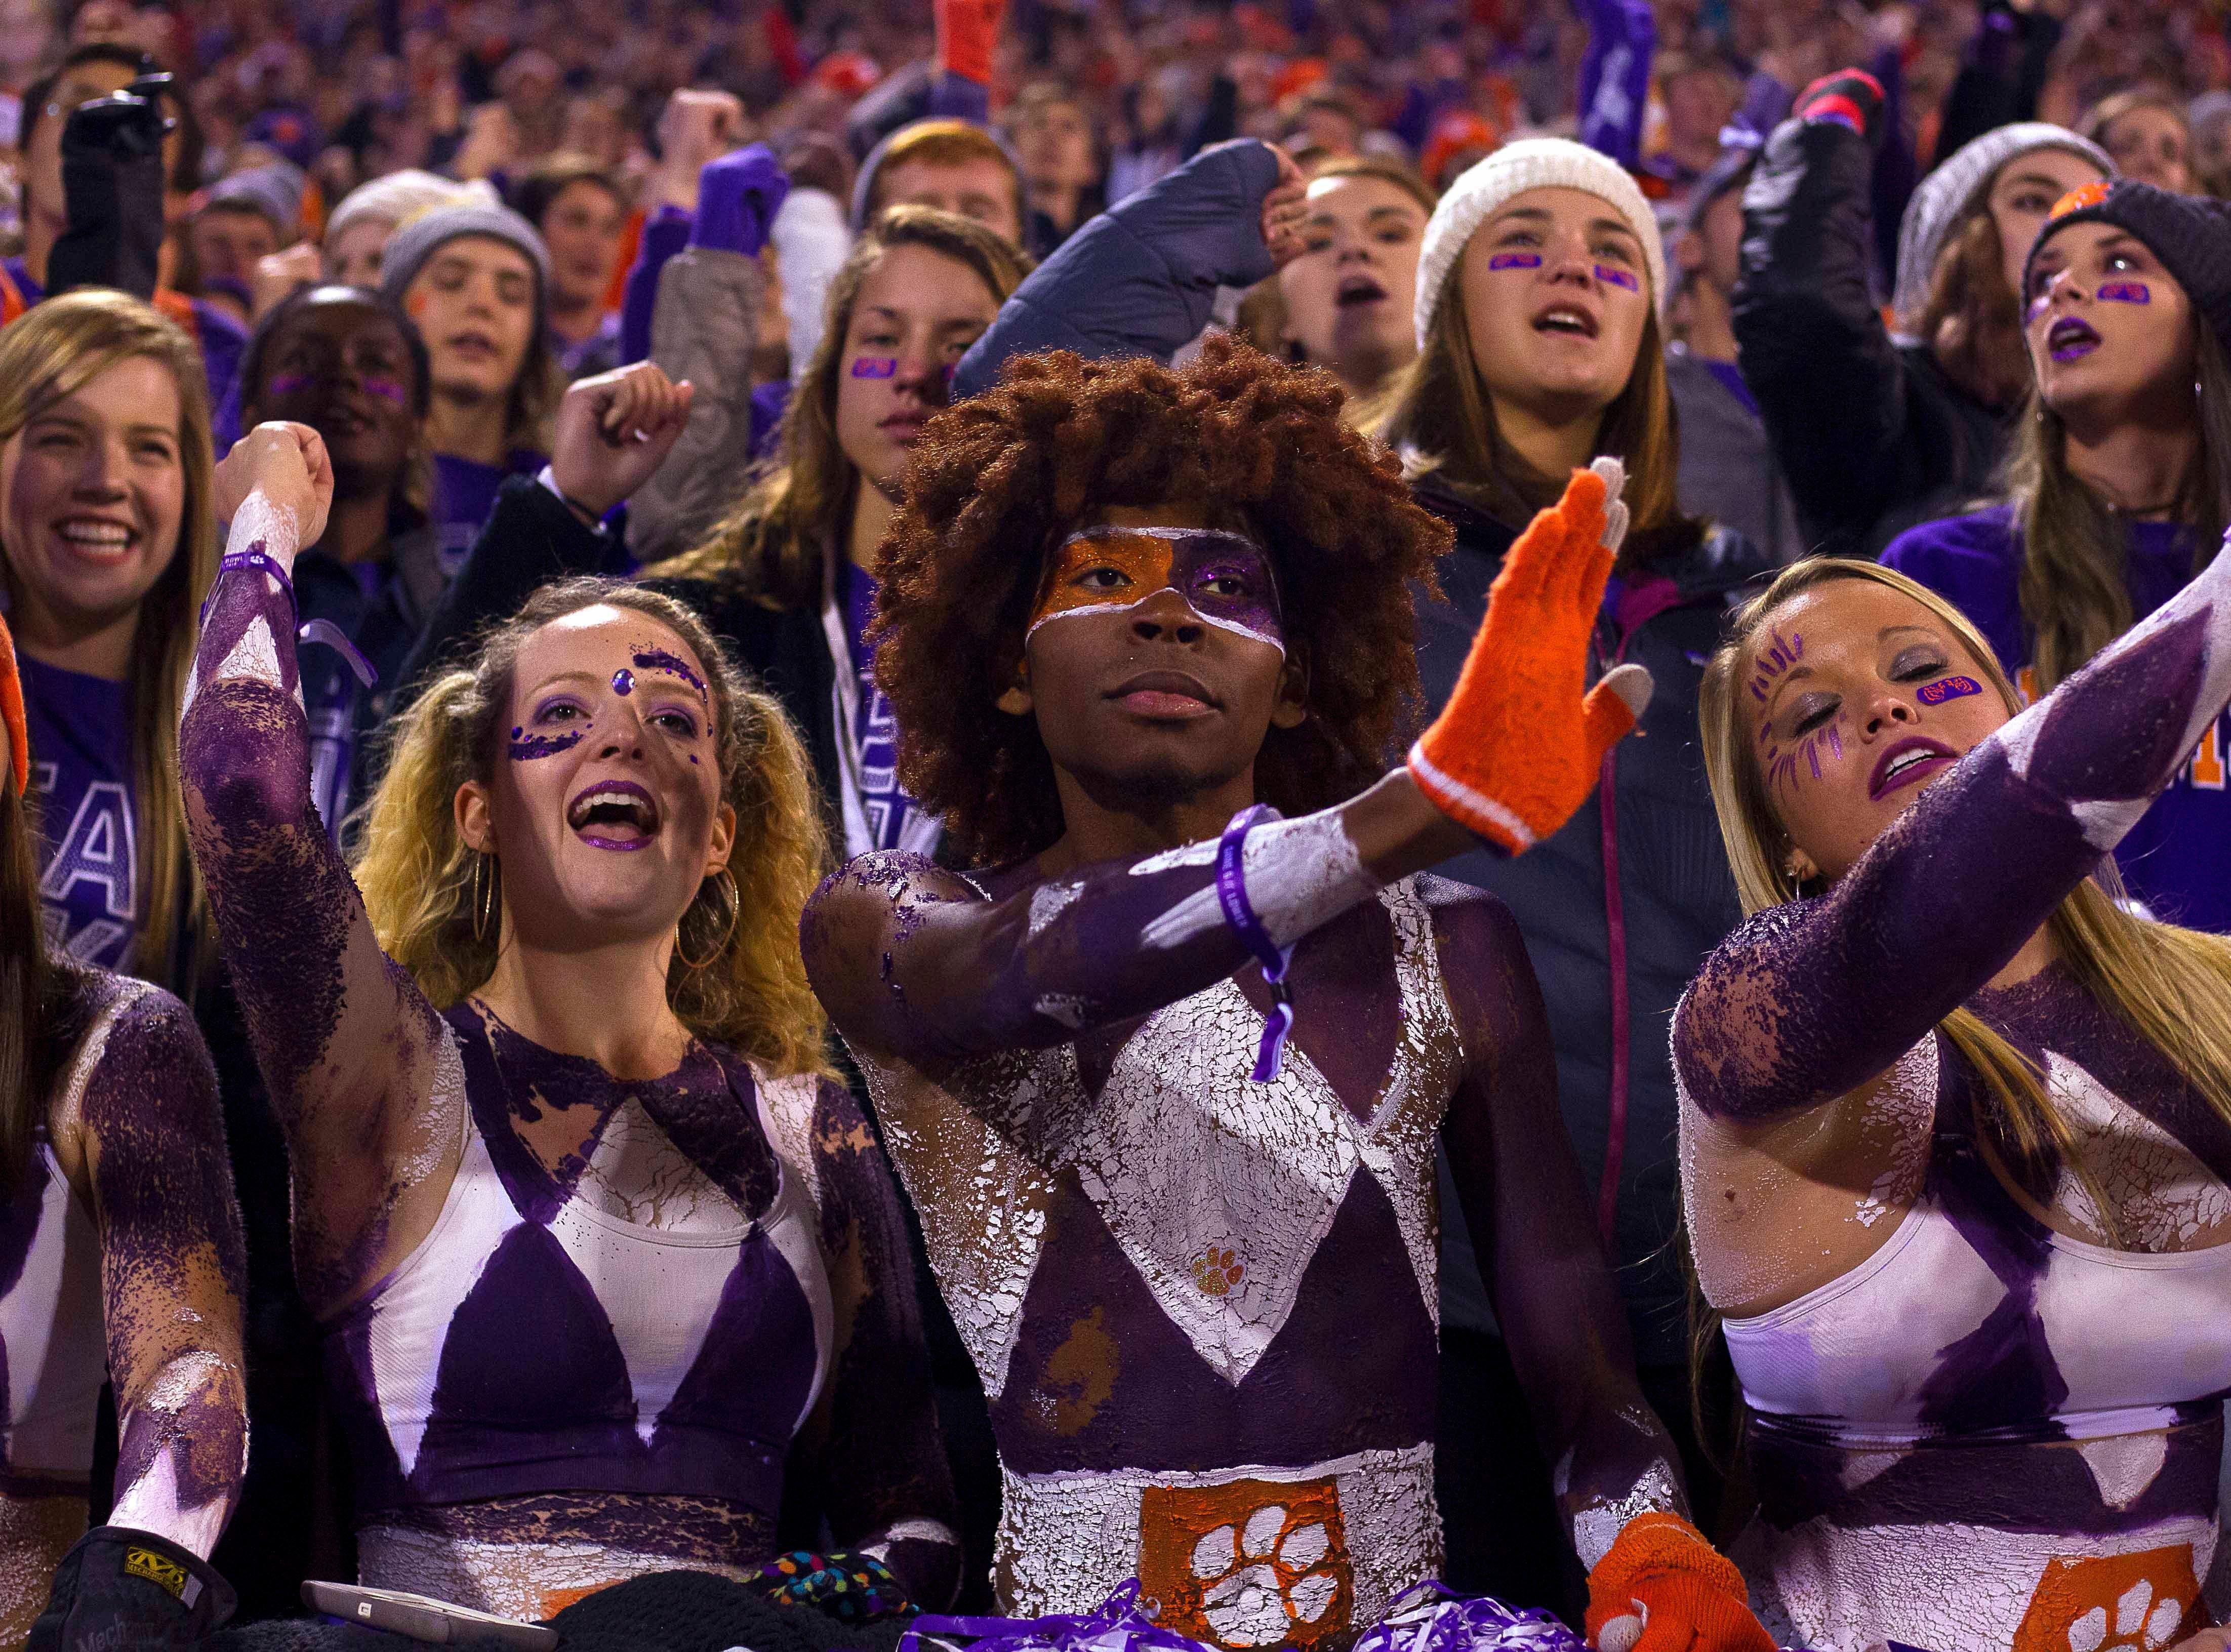 Week 12: Clemson Tigers fans during the second half against the Duke Blue Devils at Clemson Memorial Stadium.